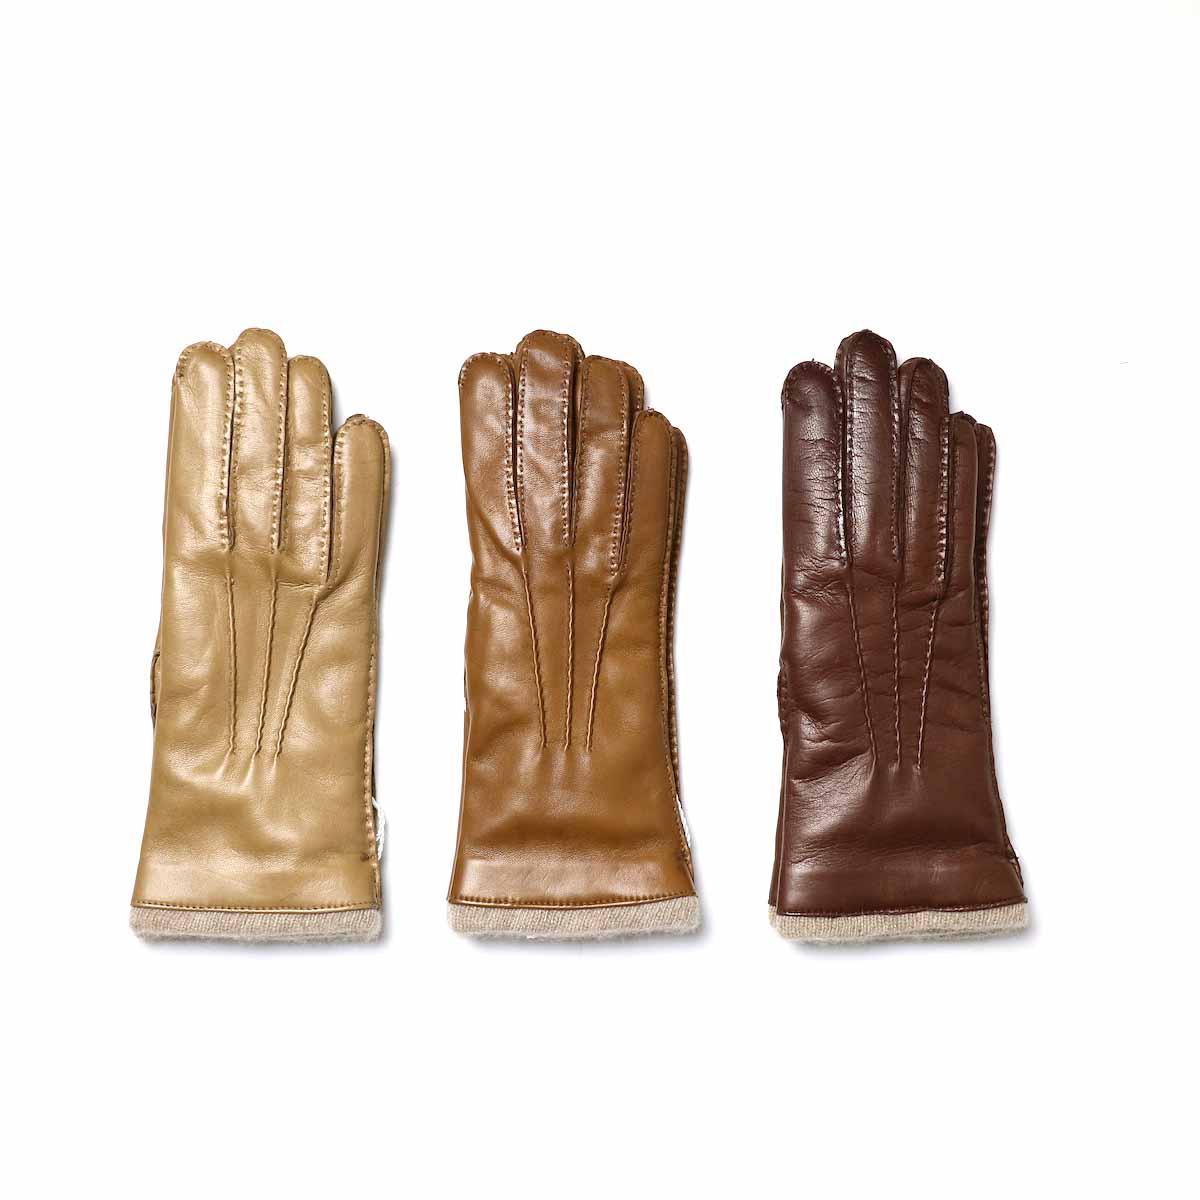 Italguanto / Leather Glove